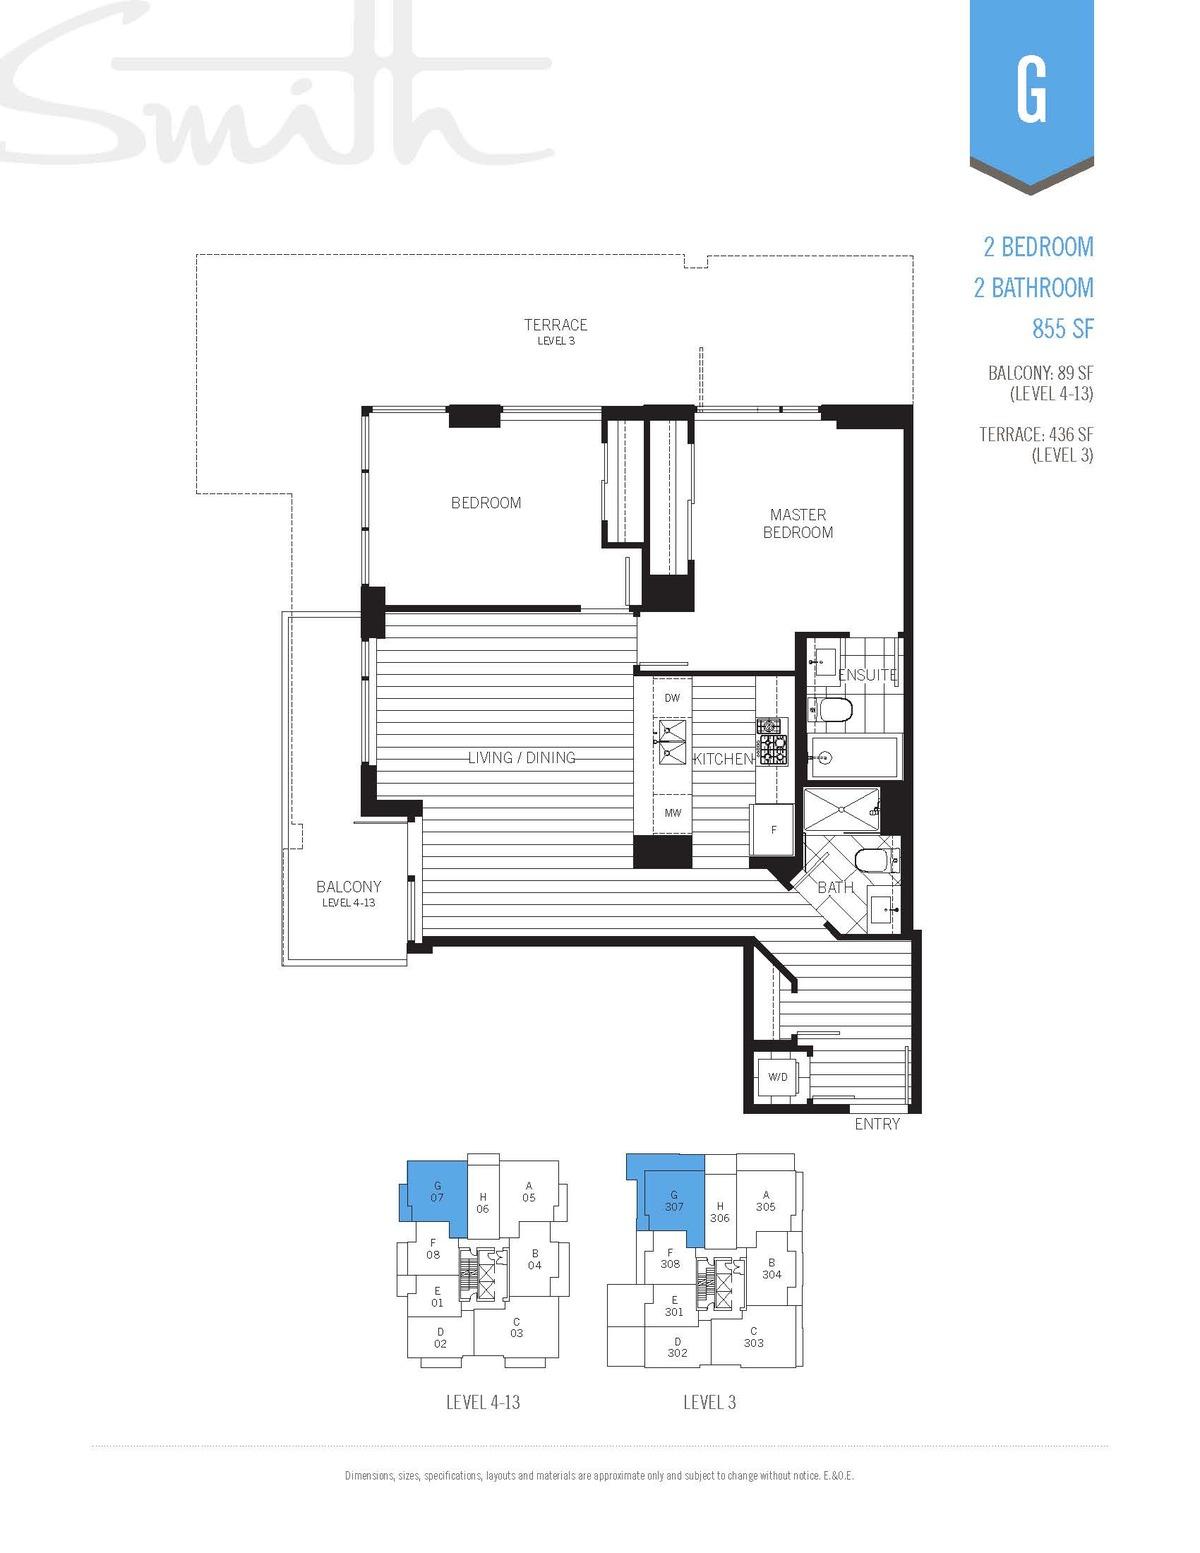 Smith Floorplan G